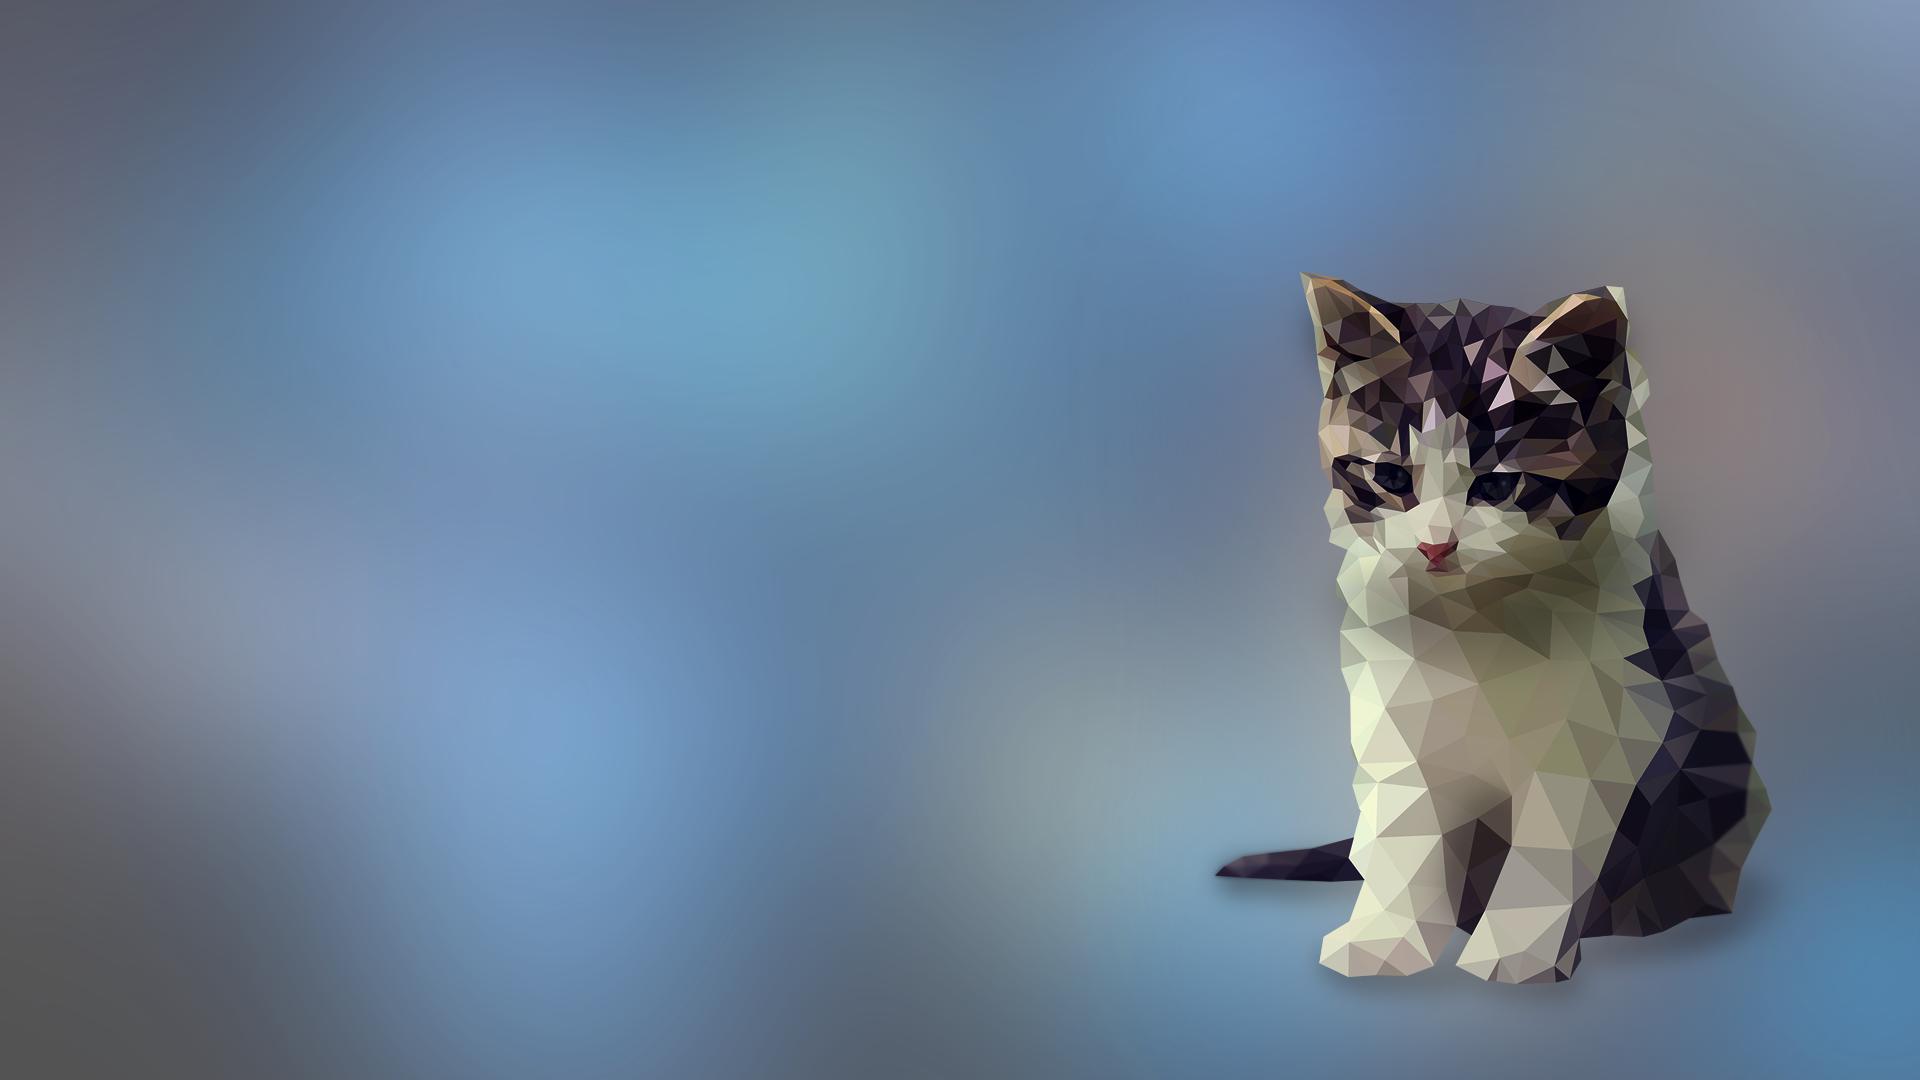 White Cat Digital Art Animals Low Poly Blue Kittens Whiskers Kitten Mammal Vertebrate Close Up